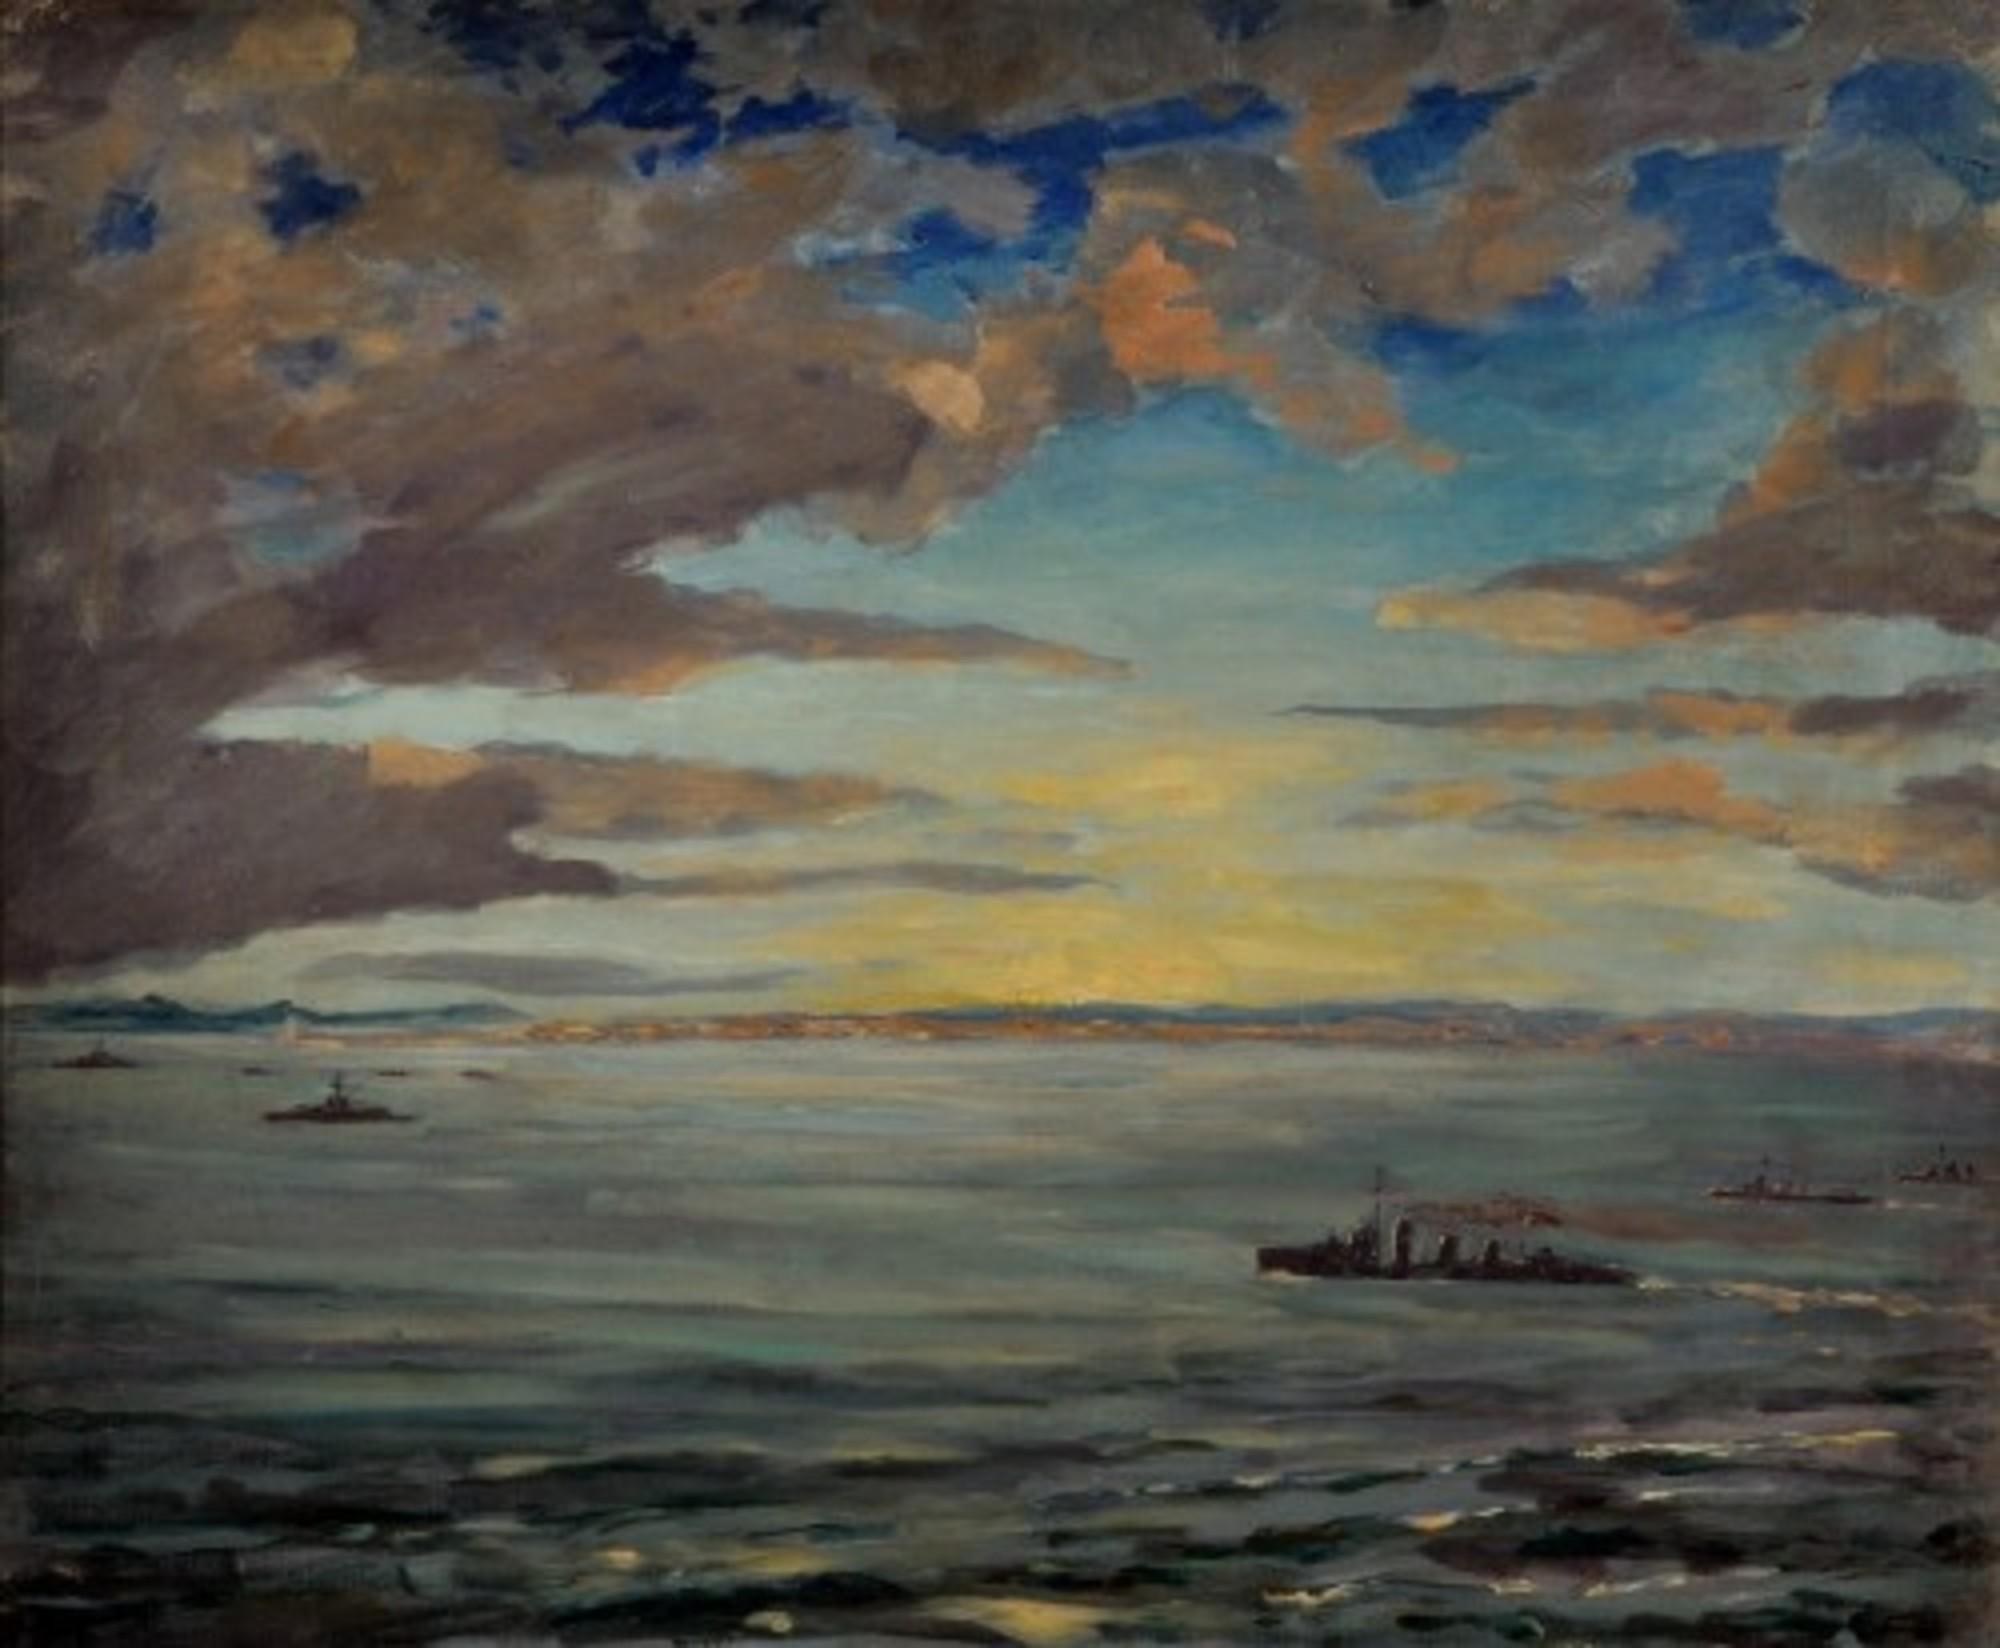 ss04-winston-churchill-painter-kempner-gallery-washington-st-louis.jpg